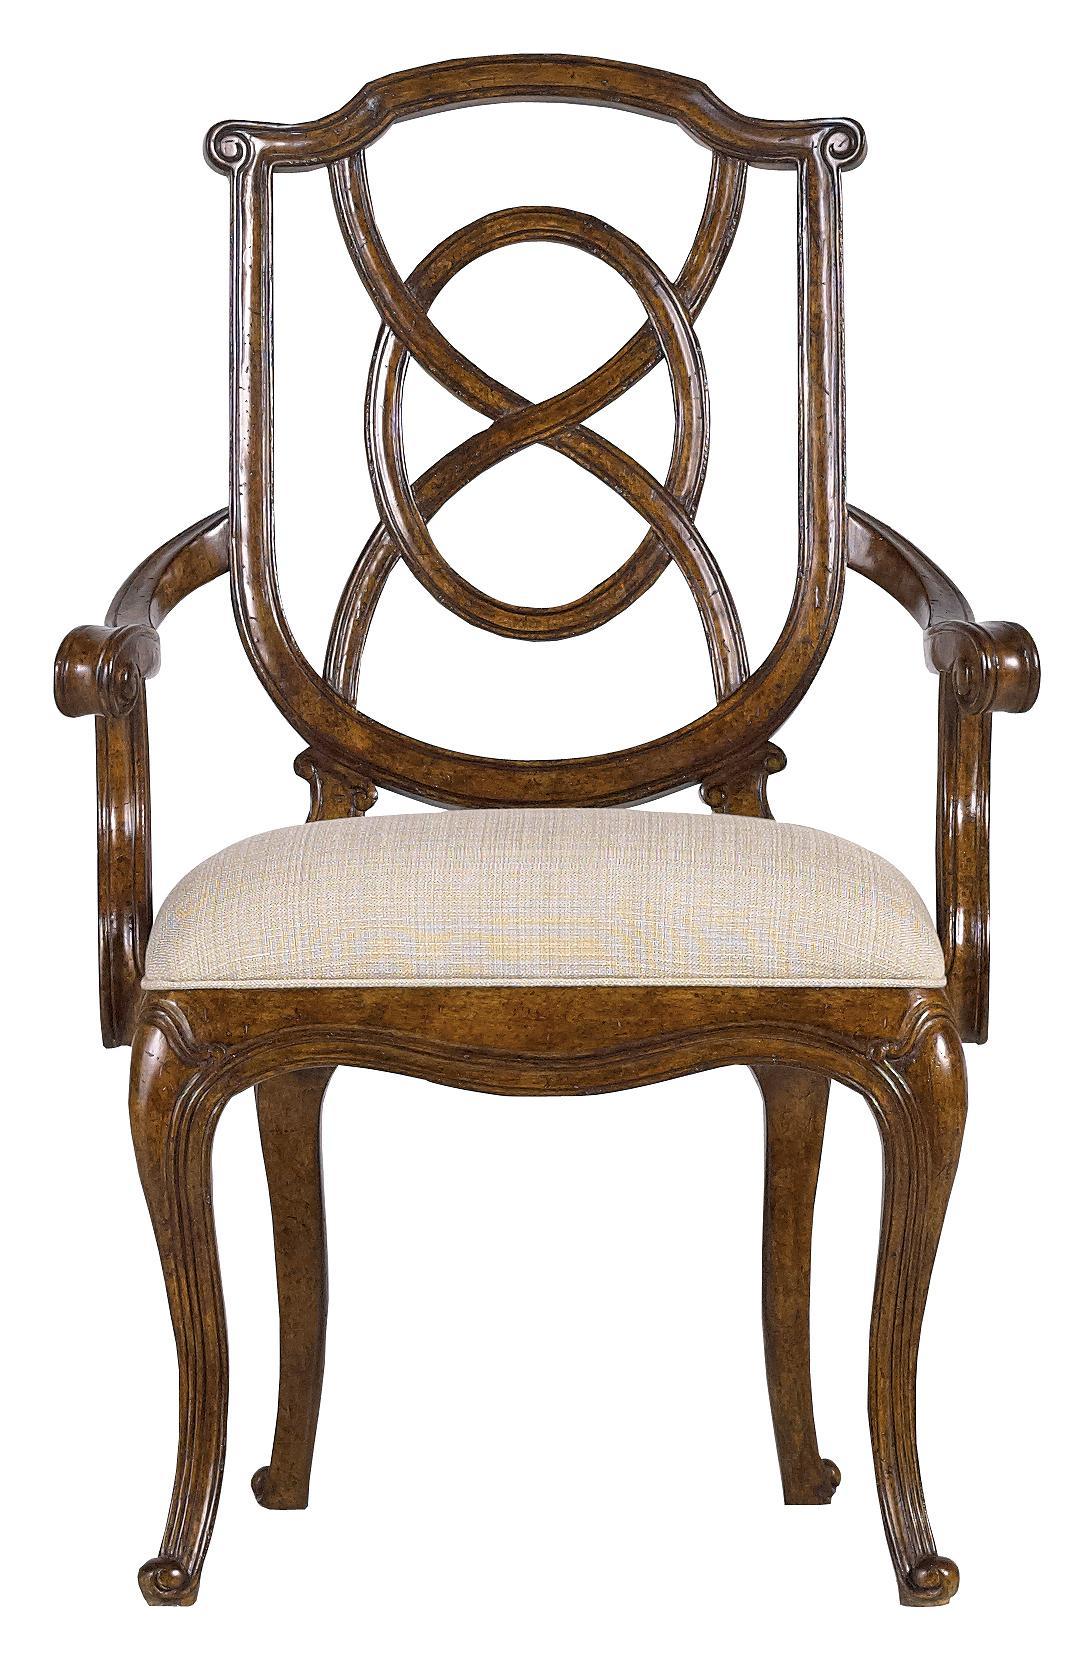 Stanley Furniture Arrondissement Tuileries Arm Chair - Item Number: 222-11-70